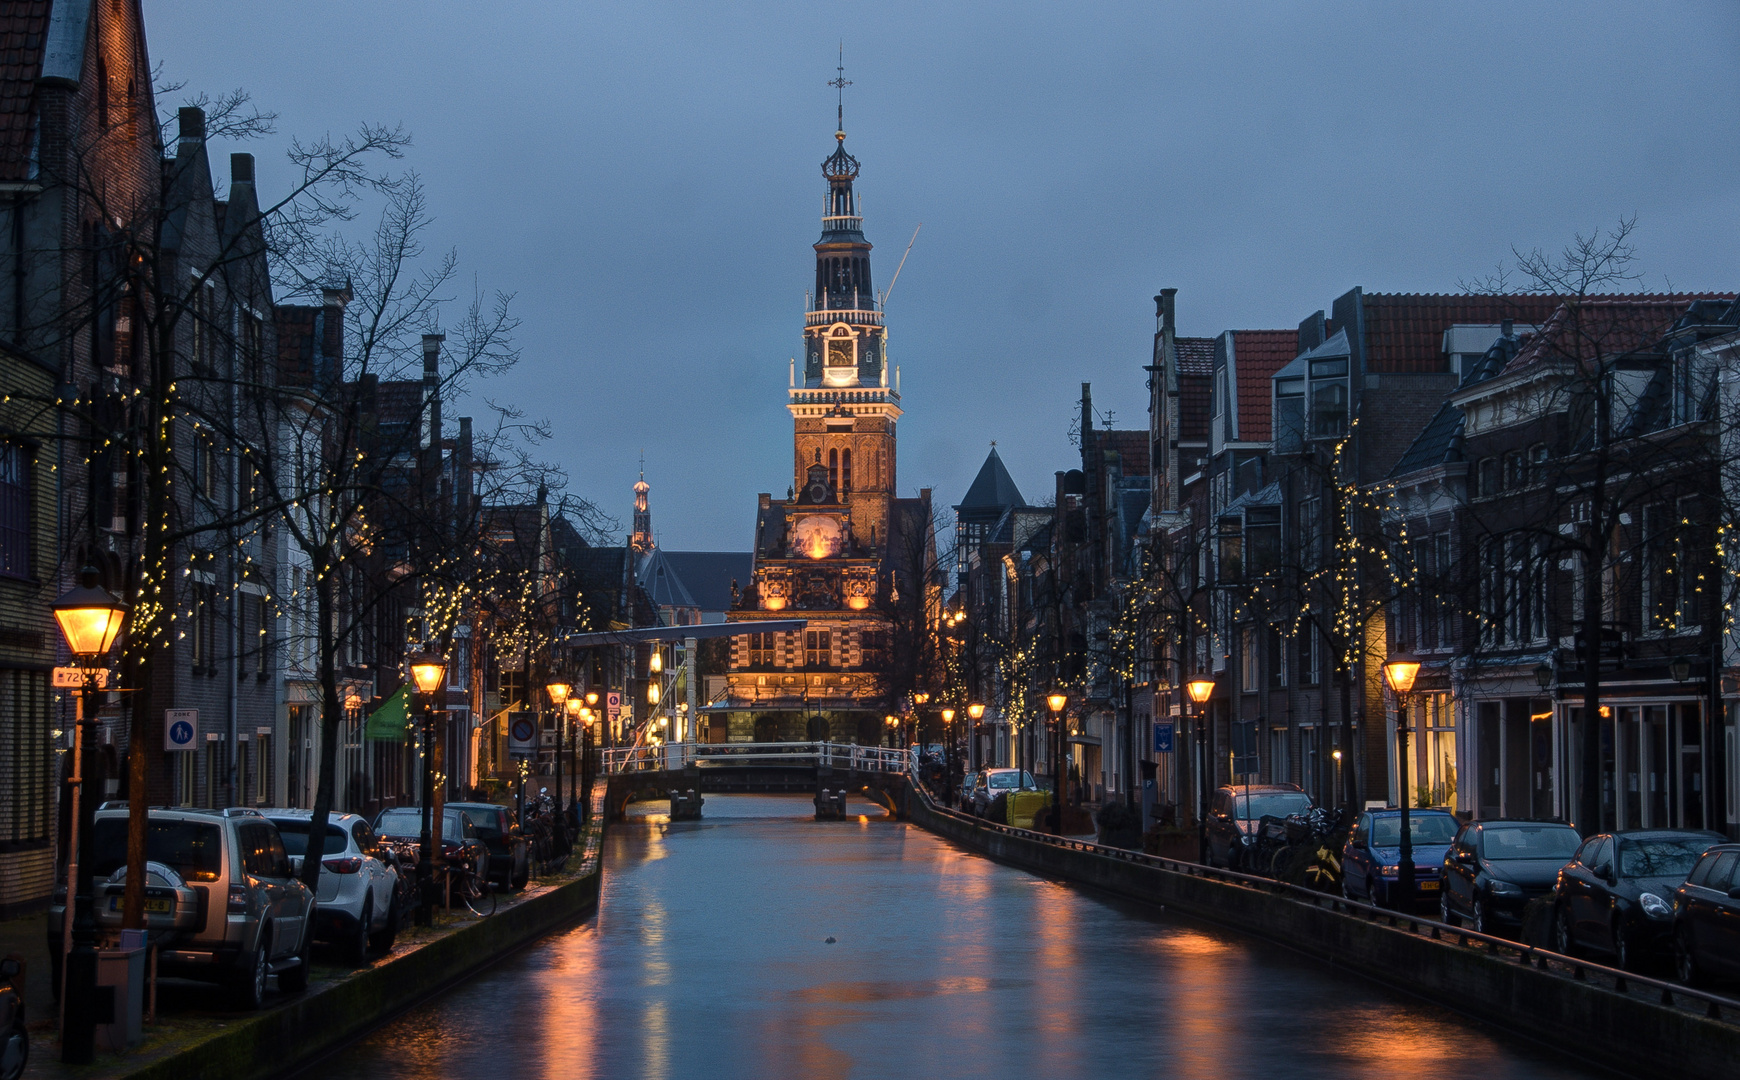 Alkmaar - Luttik Oudorp - Waag - 01